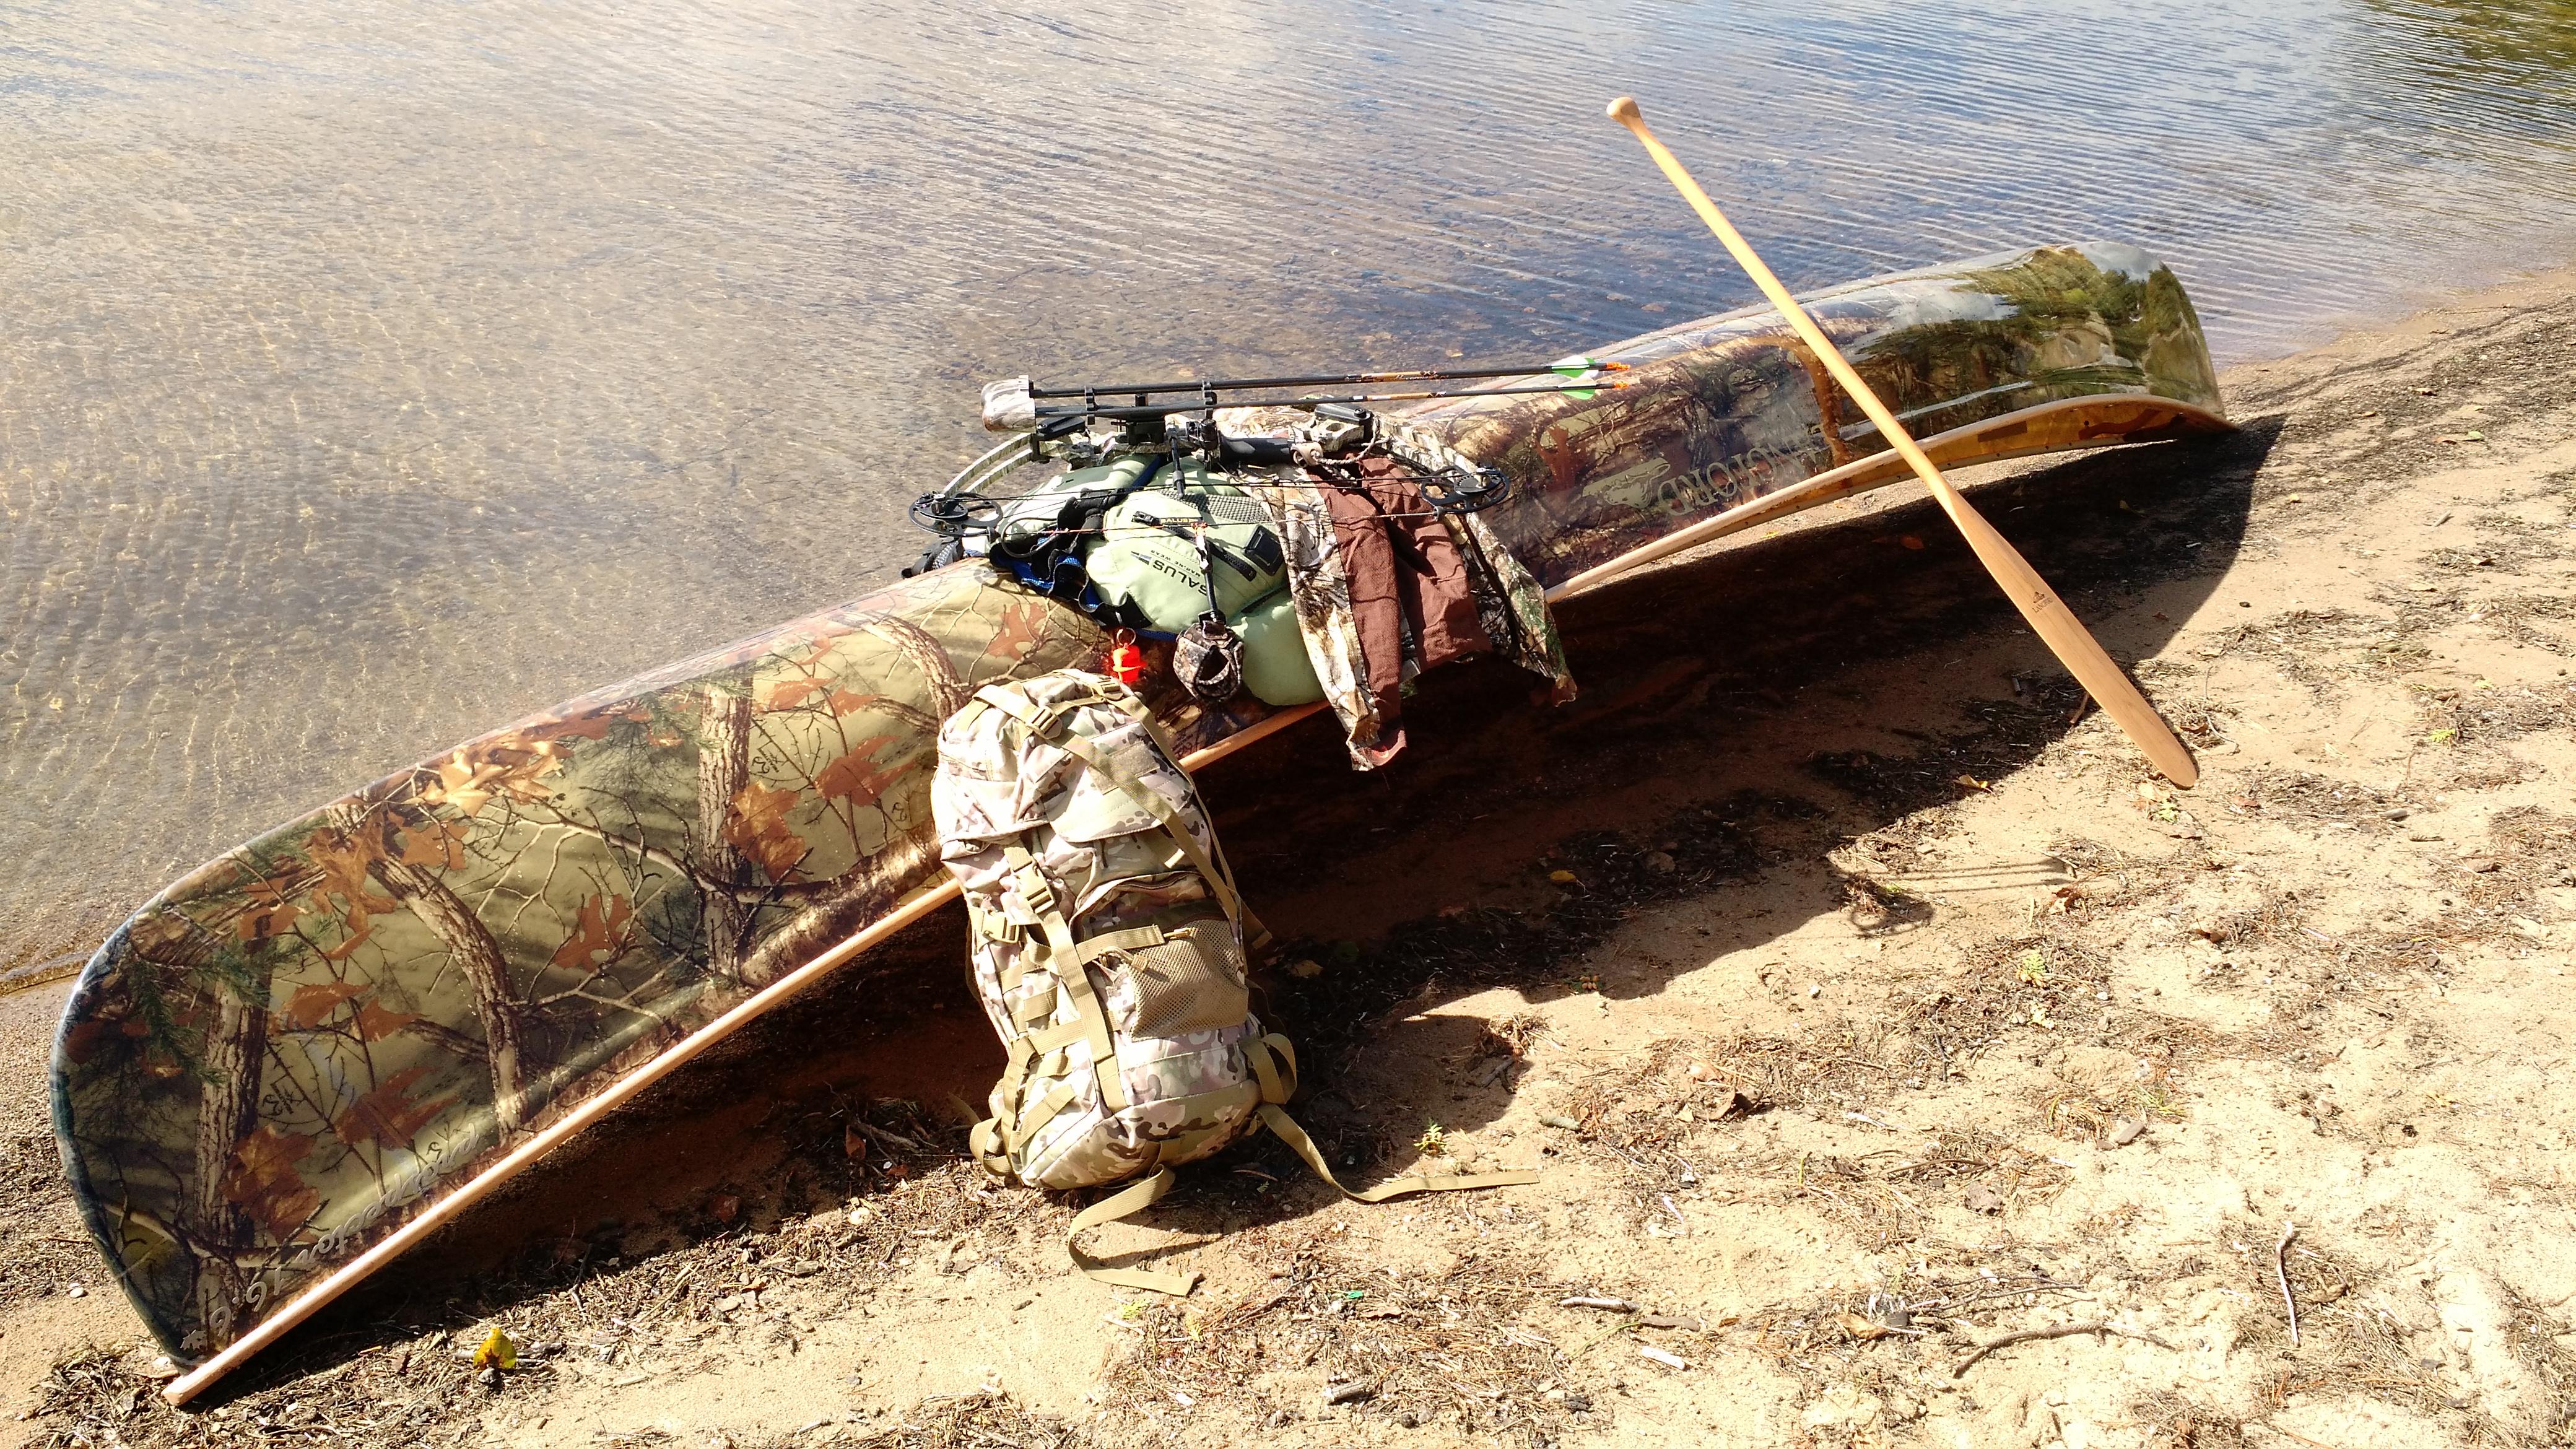 Langford Canoe Kevlar Camo Prospector 16.6